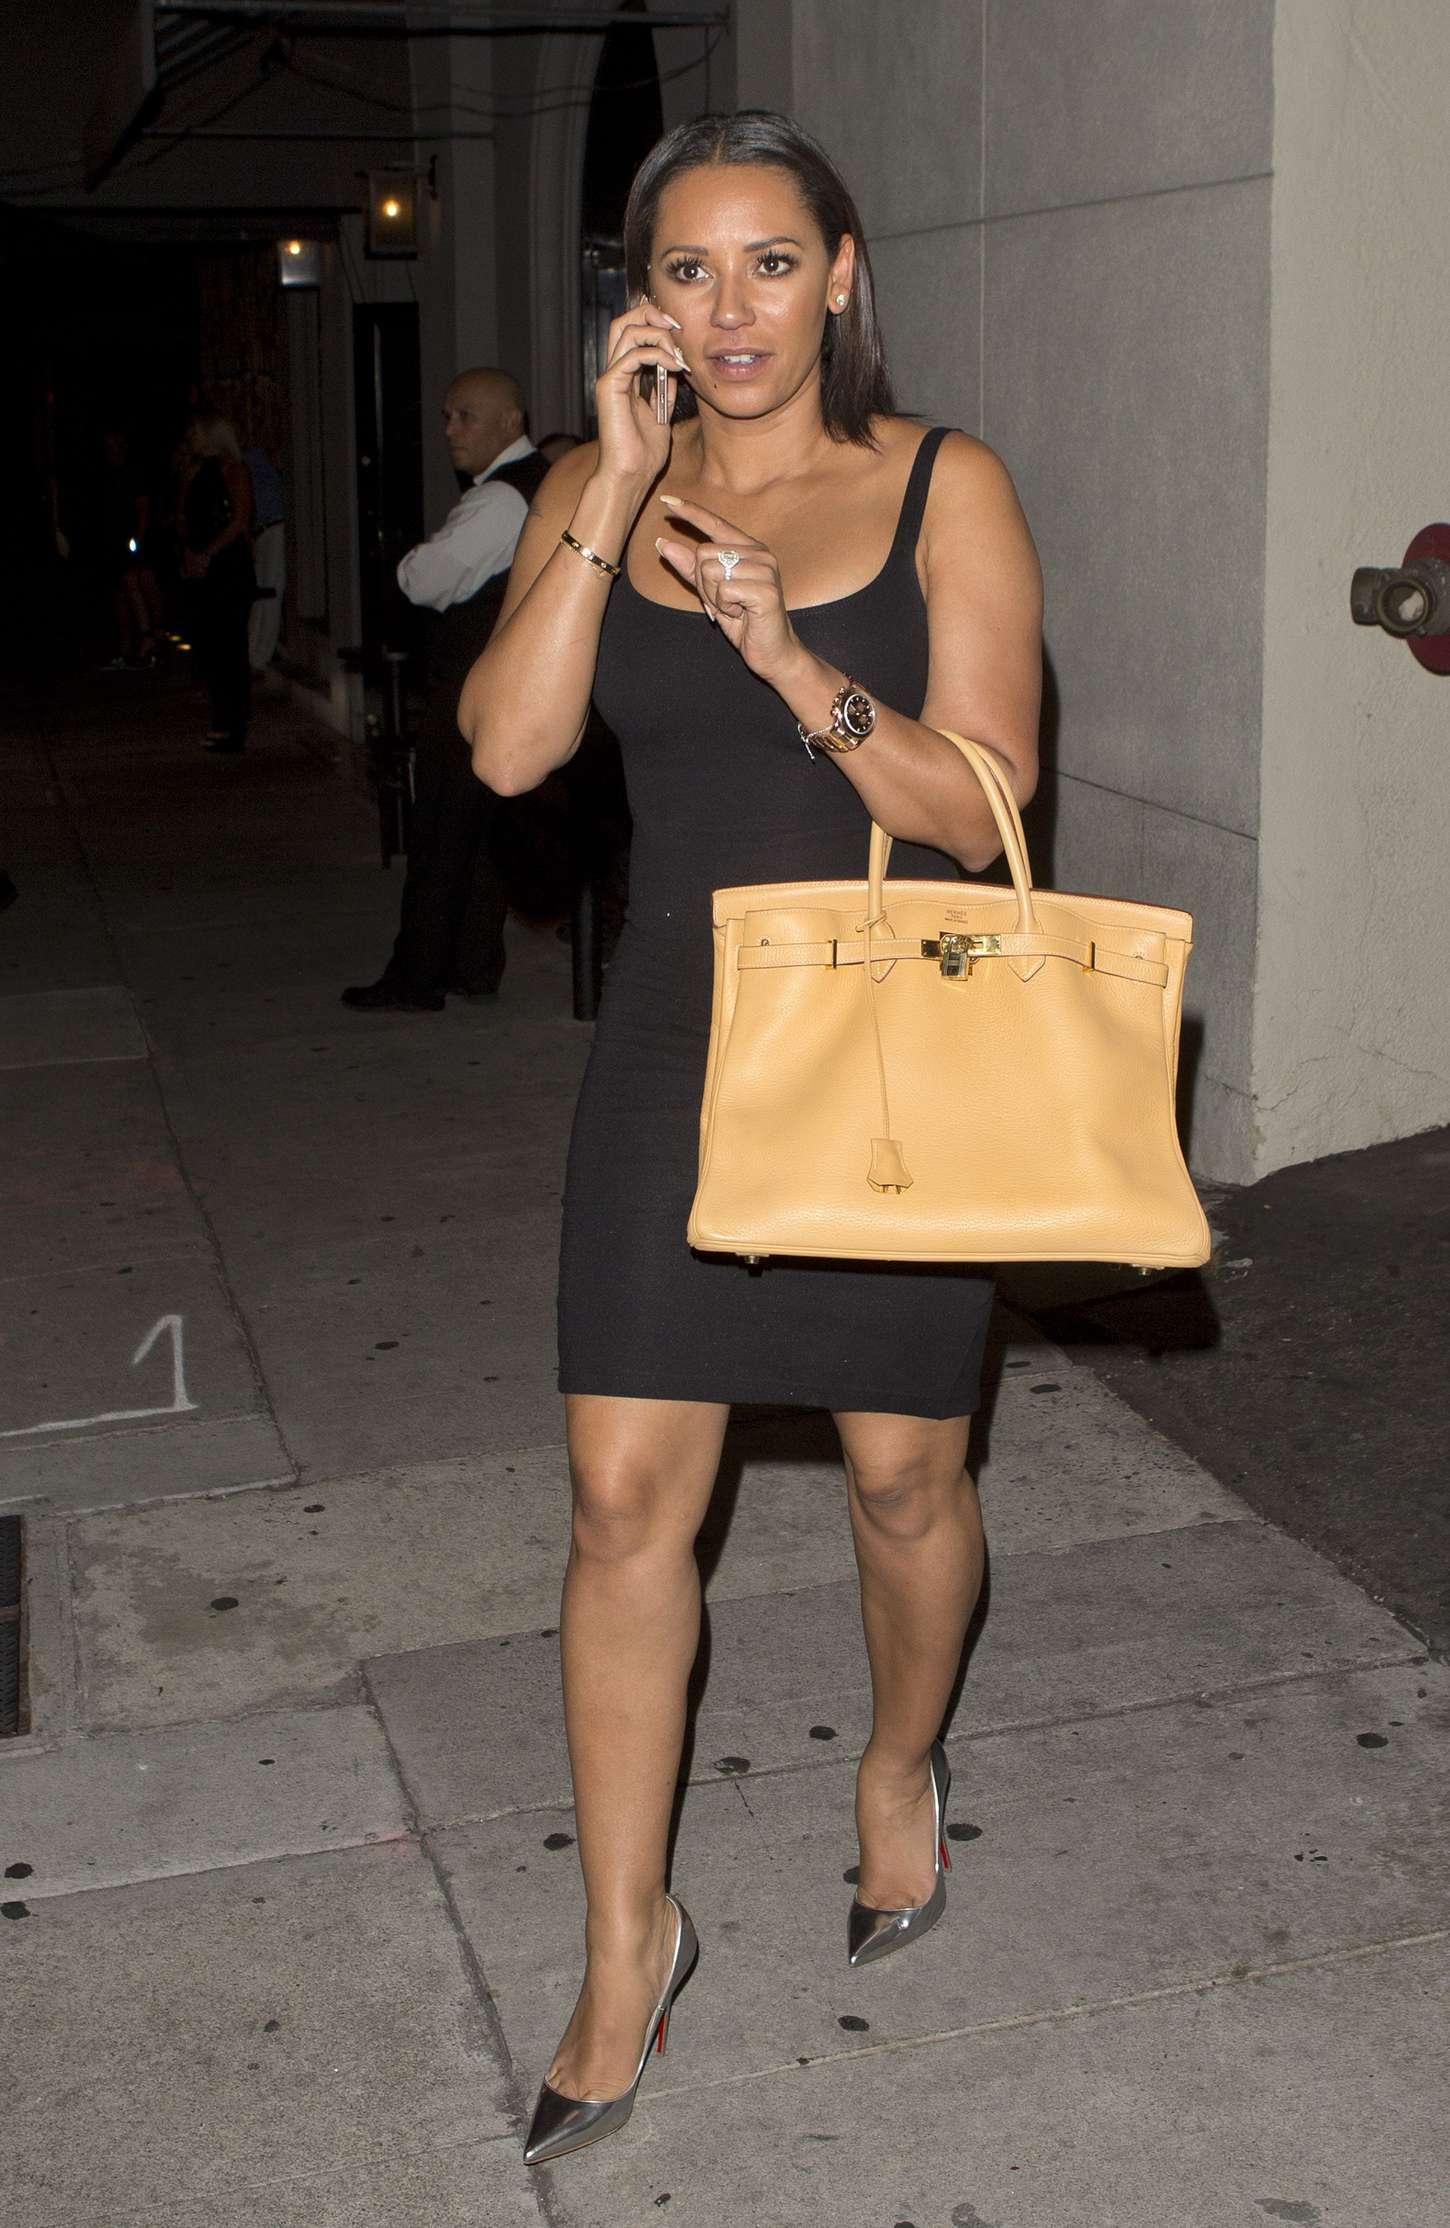 Melanie Brown in Black Mini Dress Out in LA